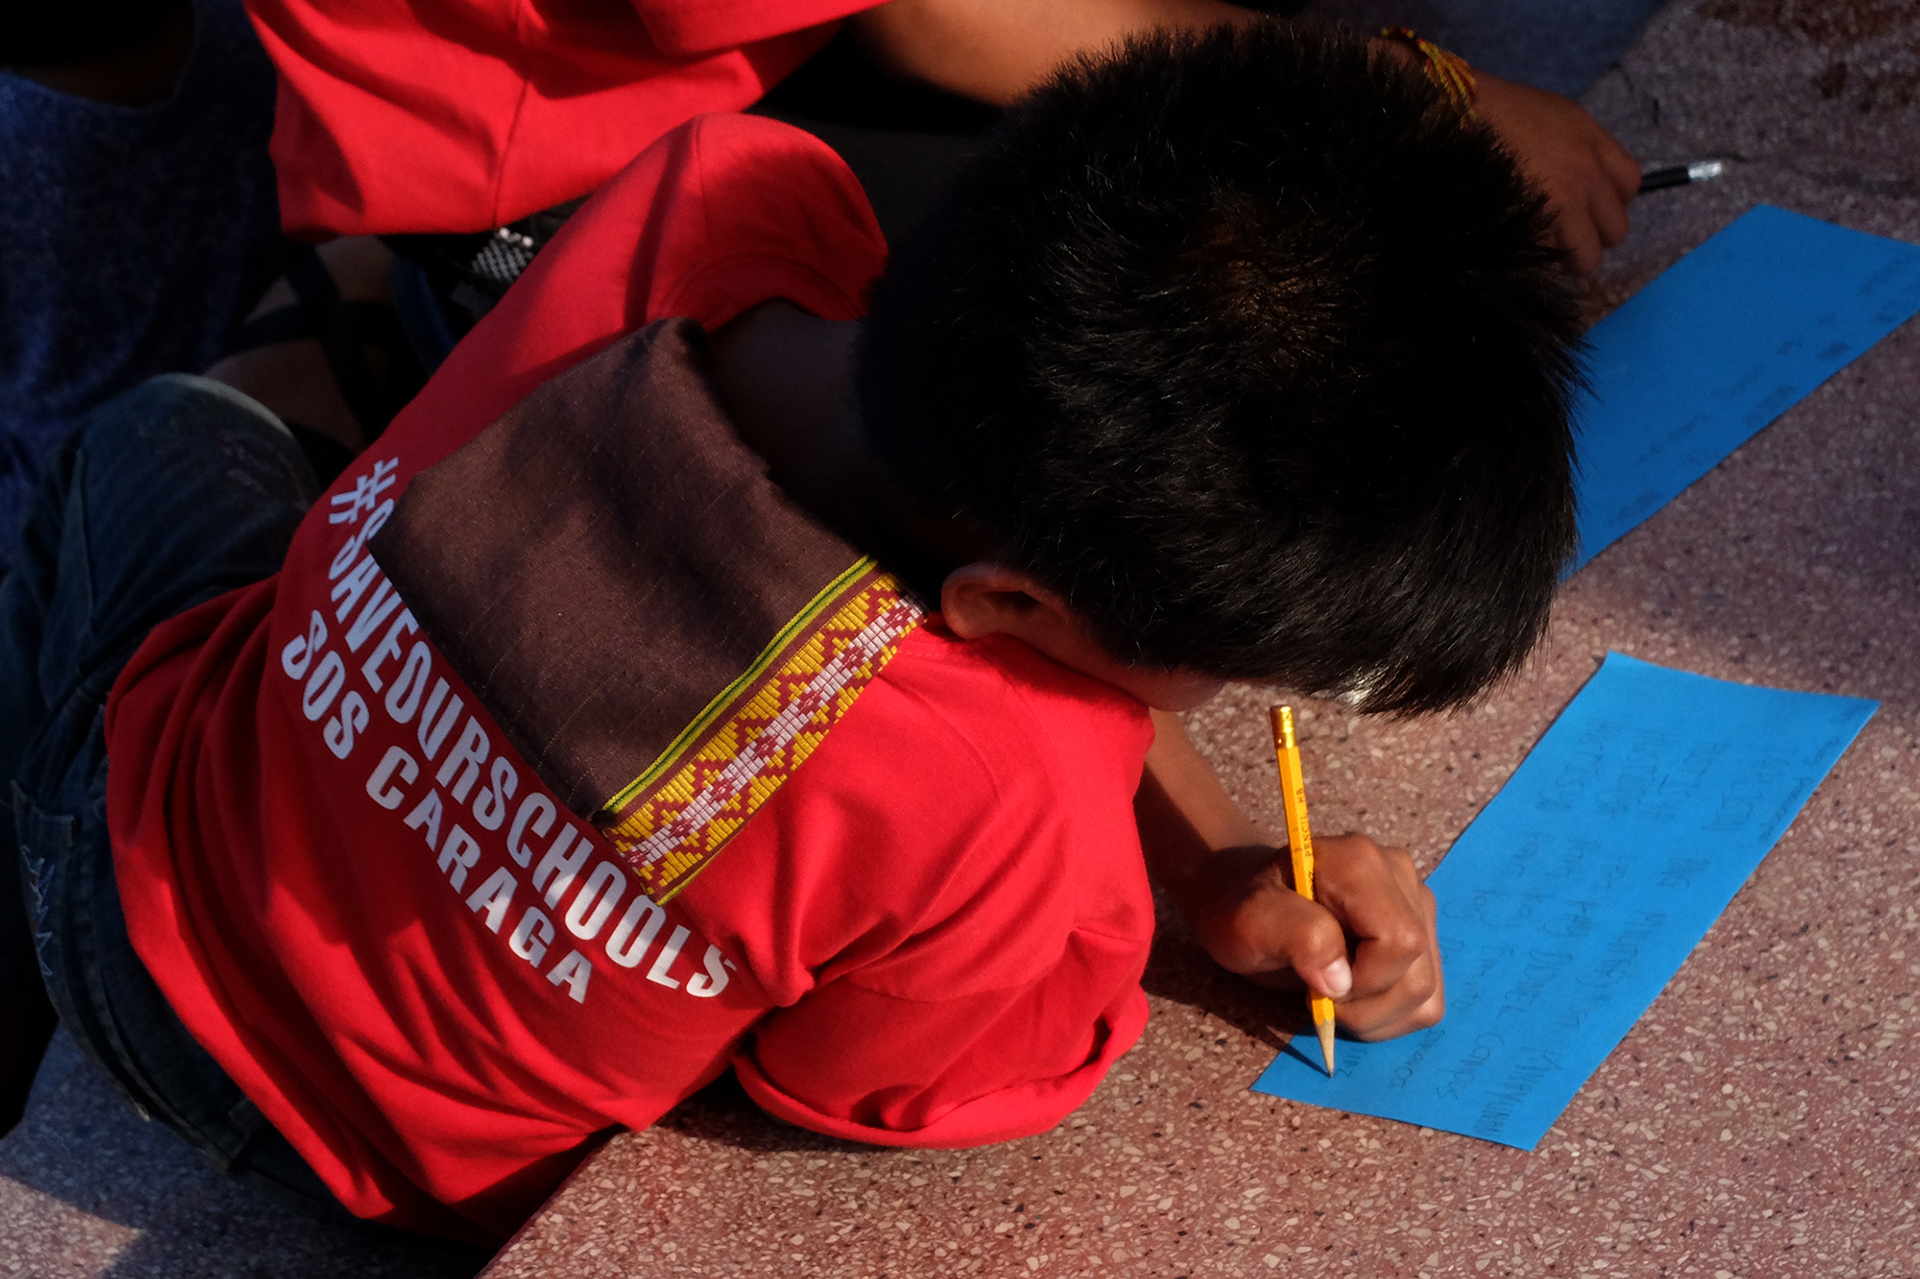 A CHILD'S WISH. A boy writes a letter to President Rodrigo Duterte. Photo by Angie de Silva/Rappler